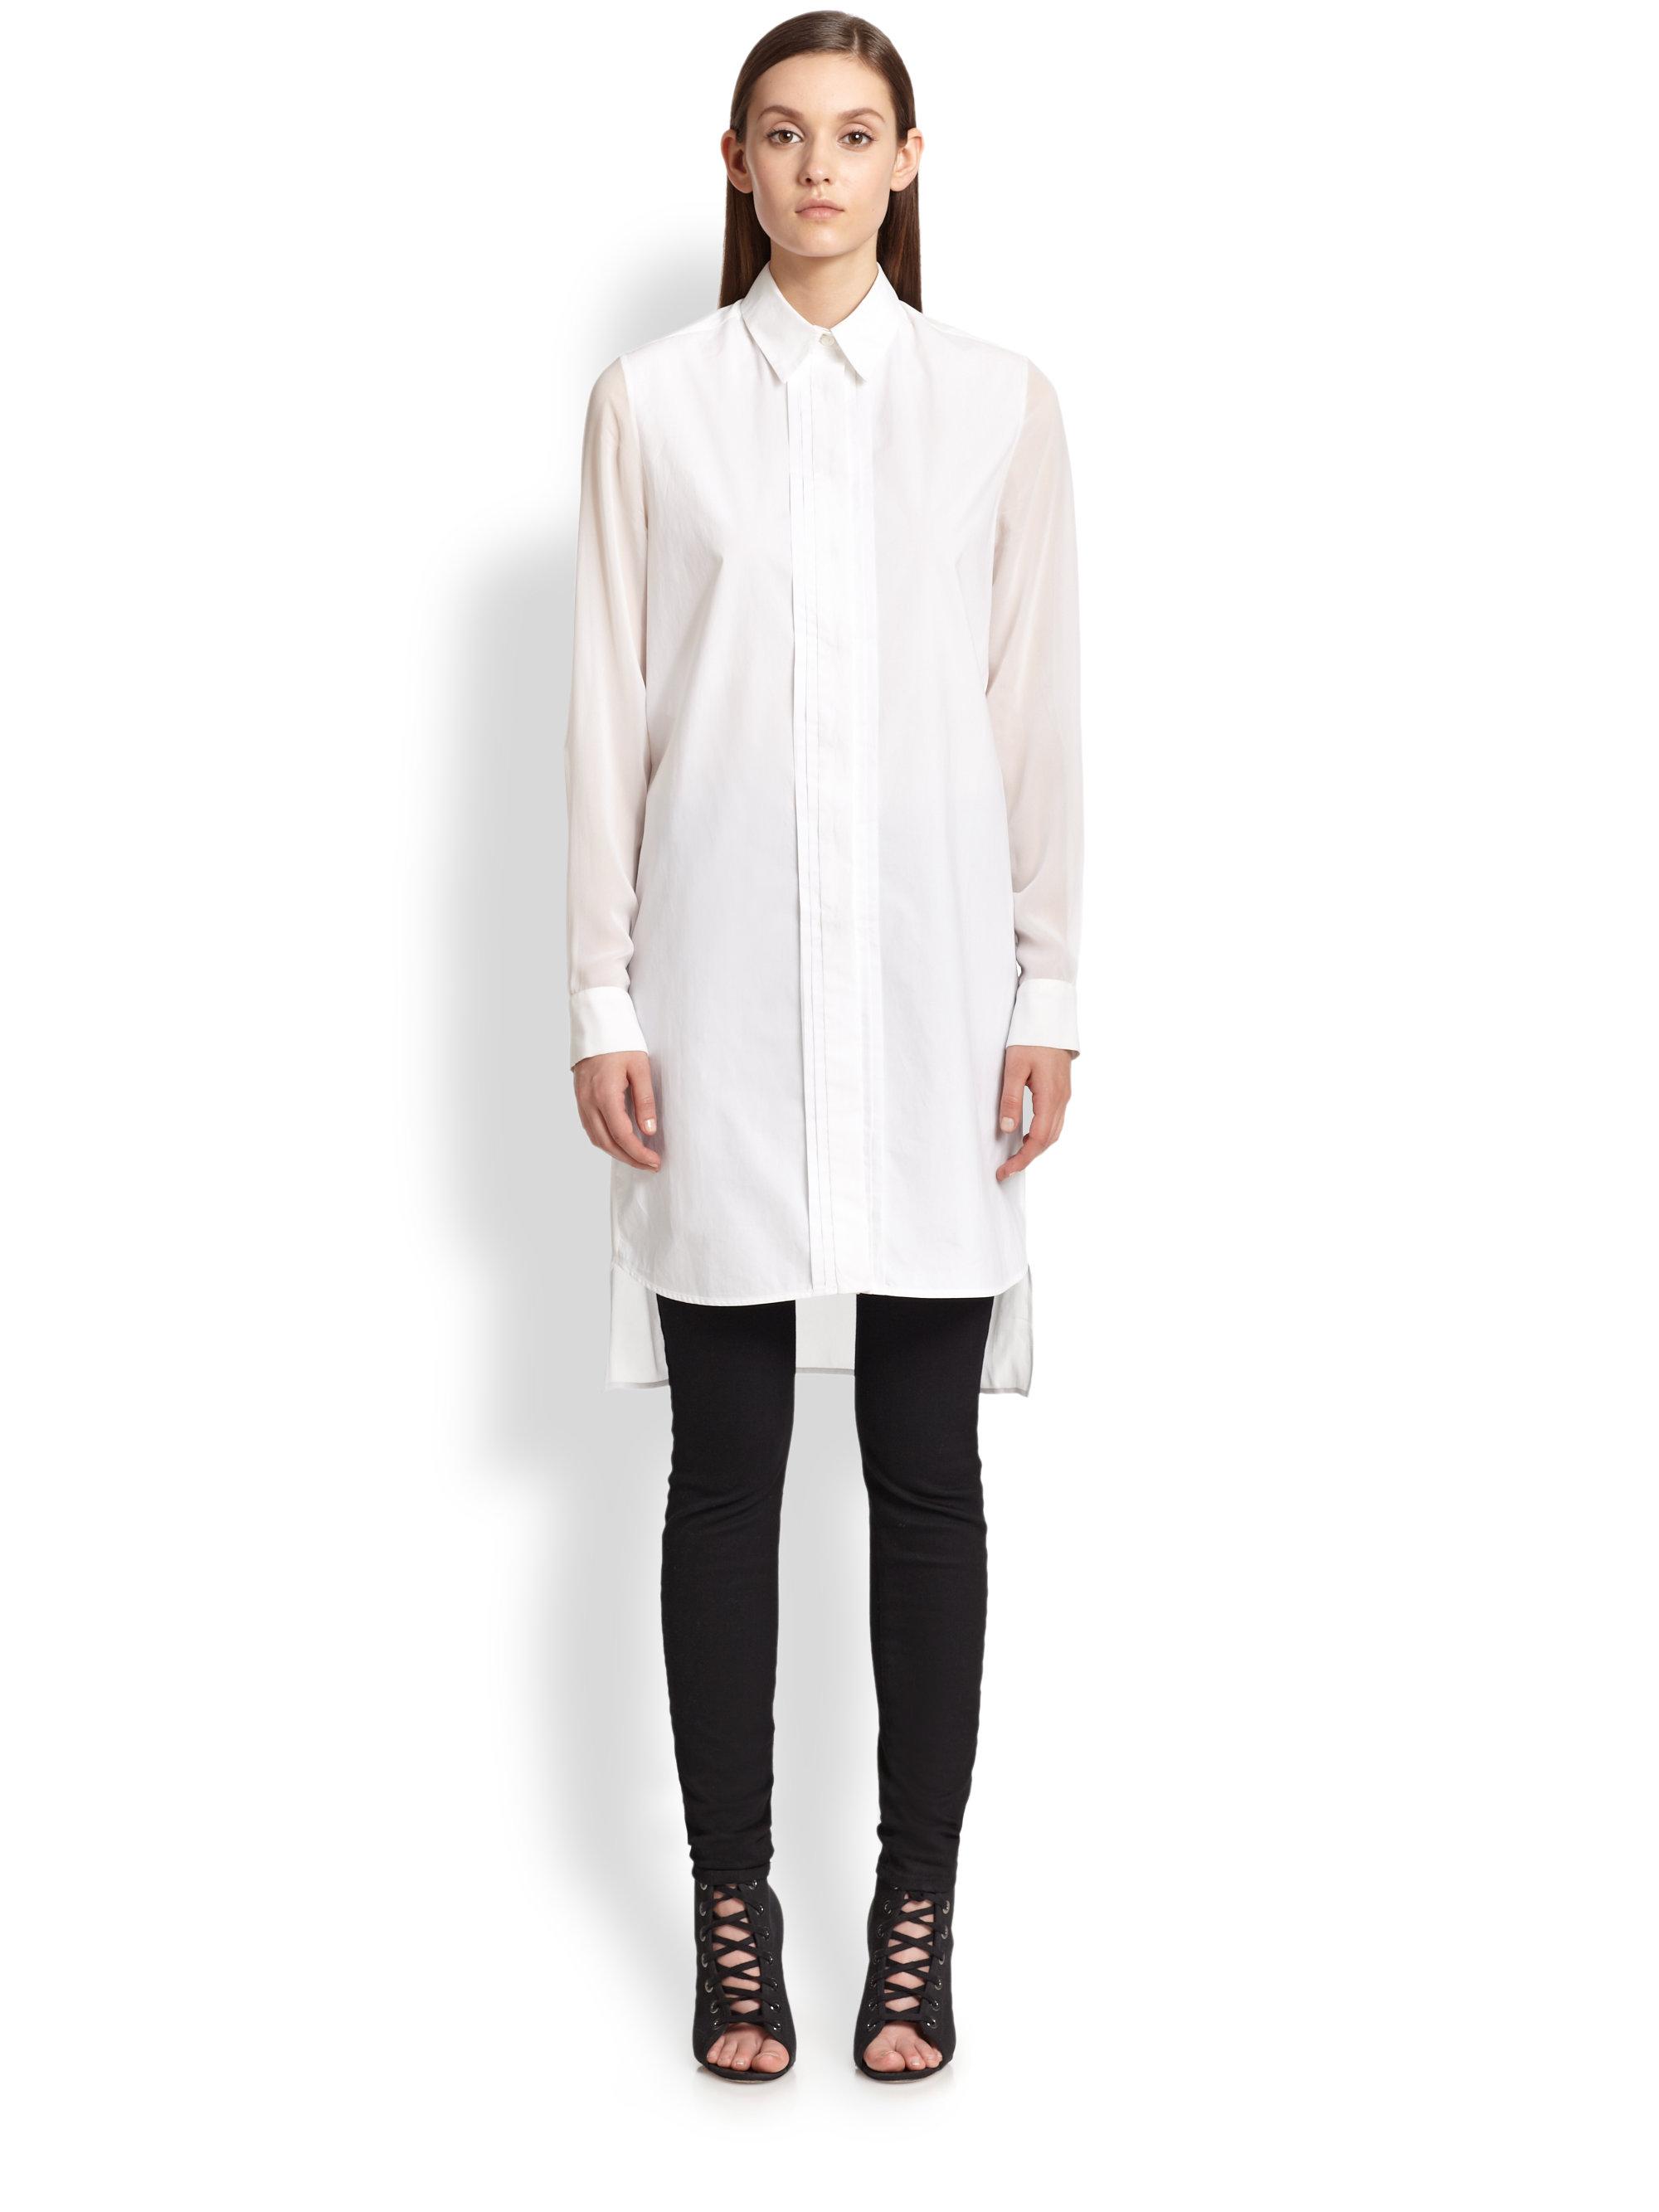 Mcq Cotton & Sheer Silk Chiffon Shirtdress in White   Lyst